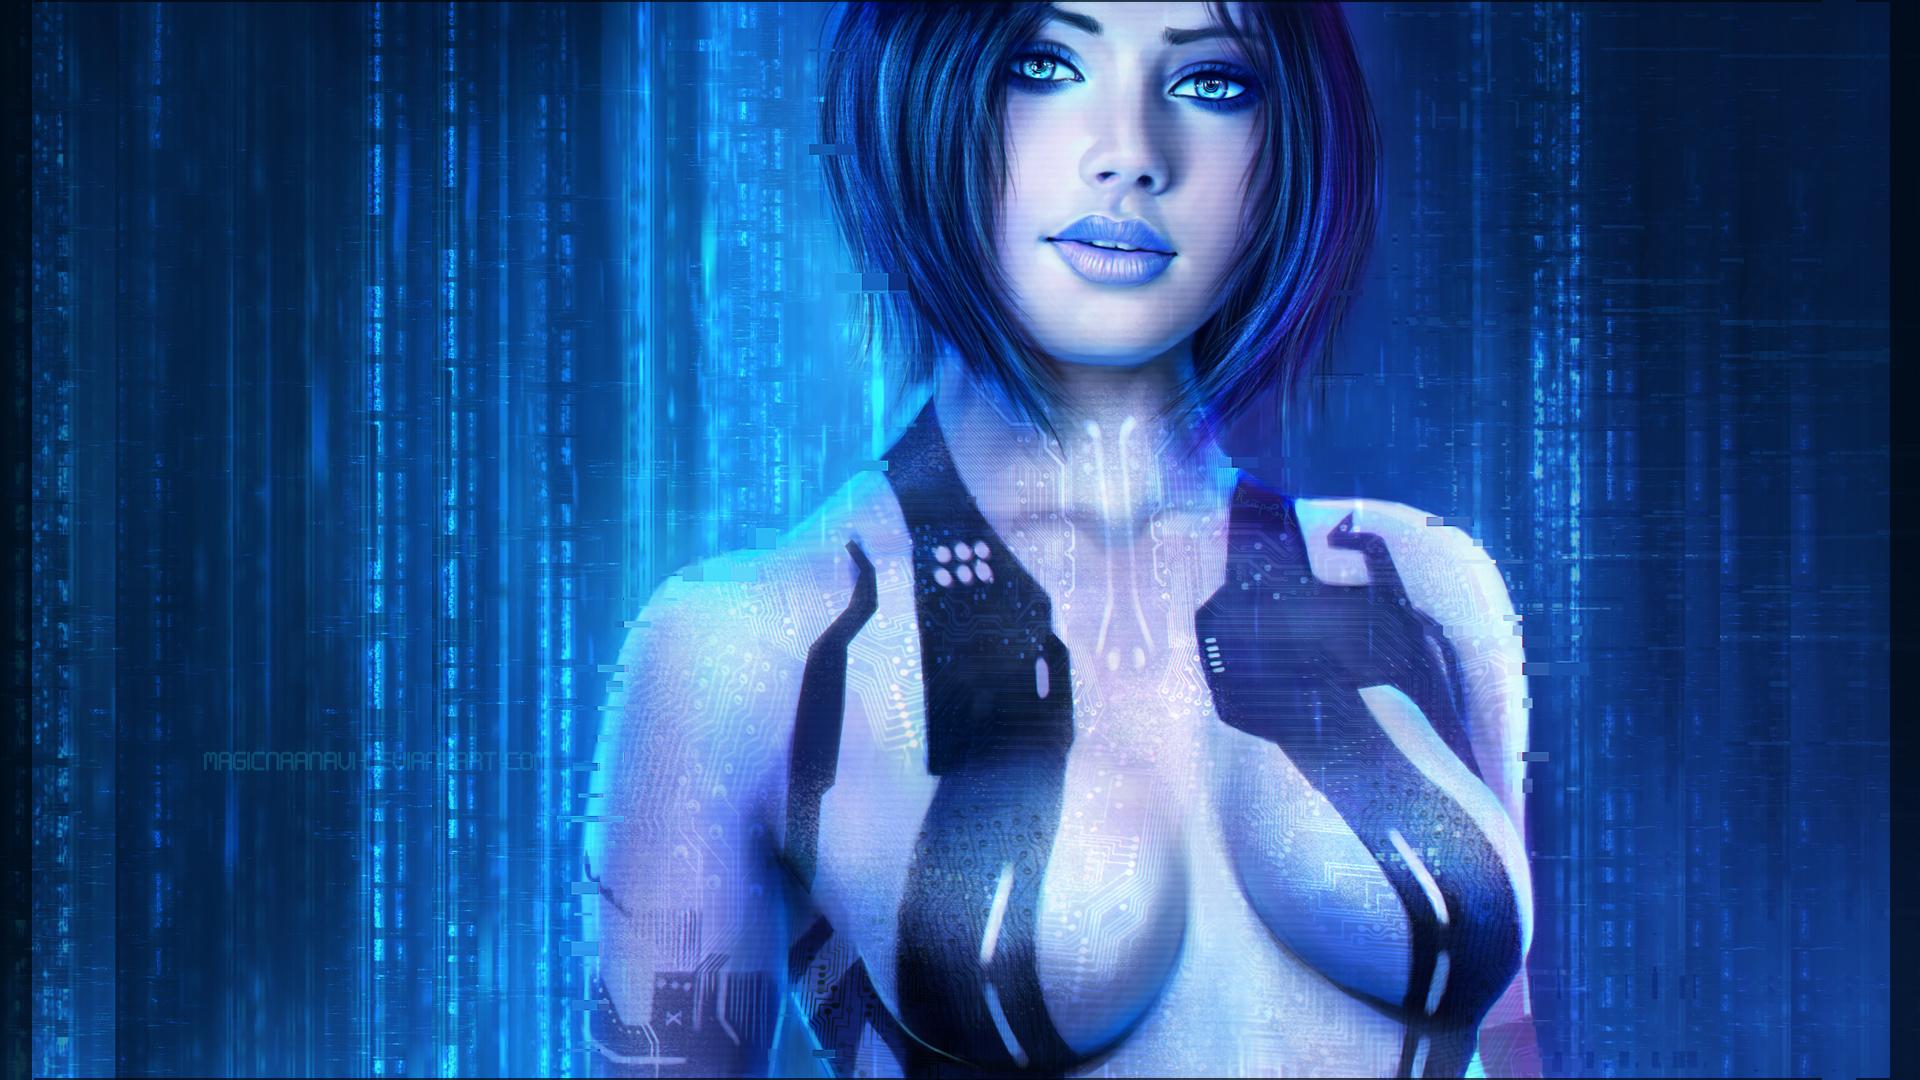 Cortana by MagicnaAnavi